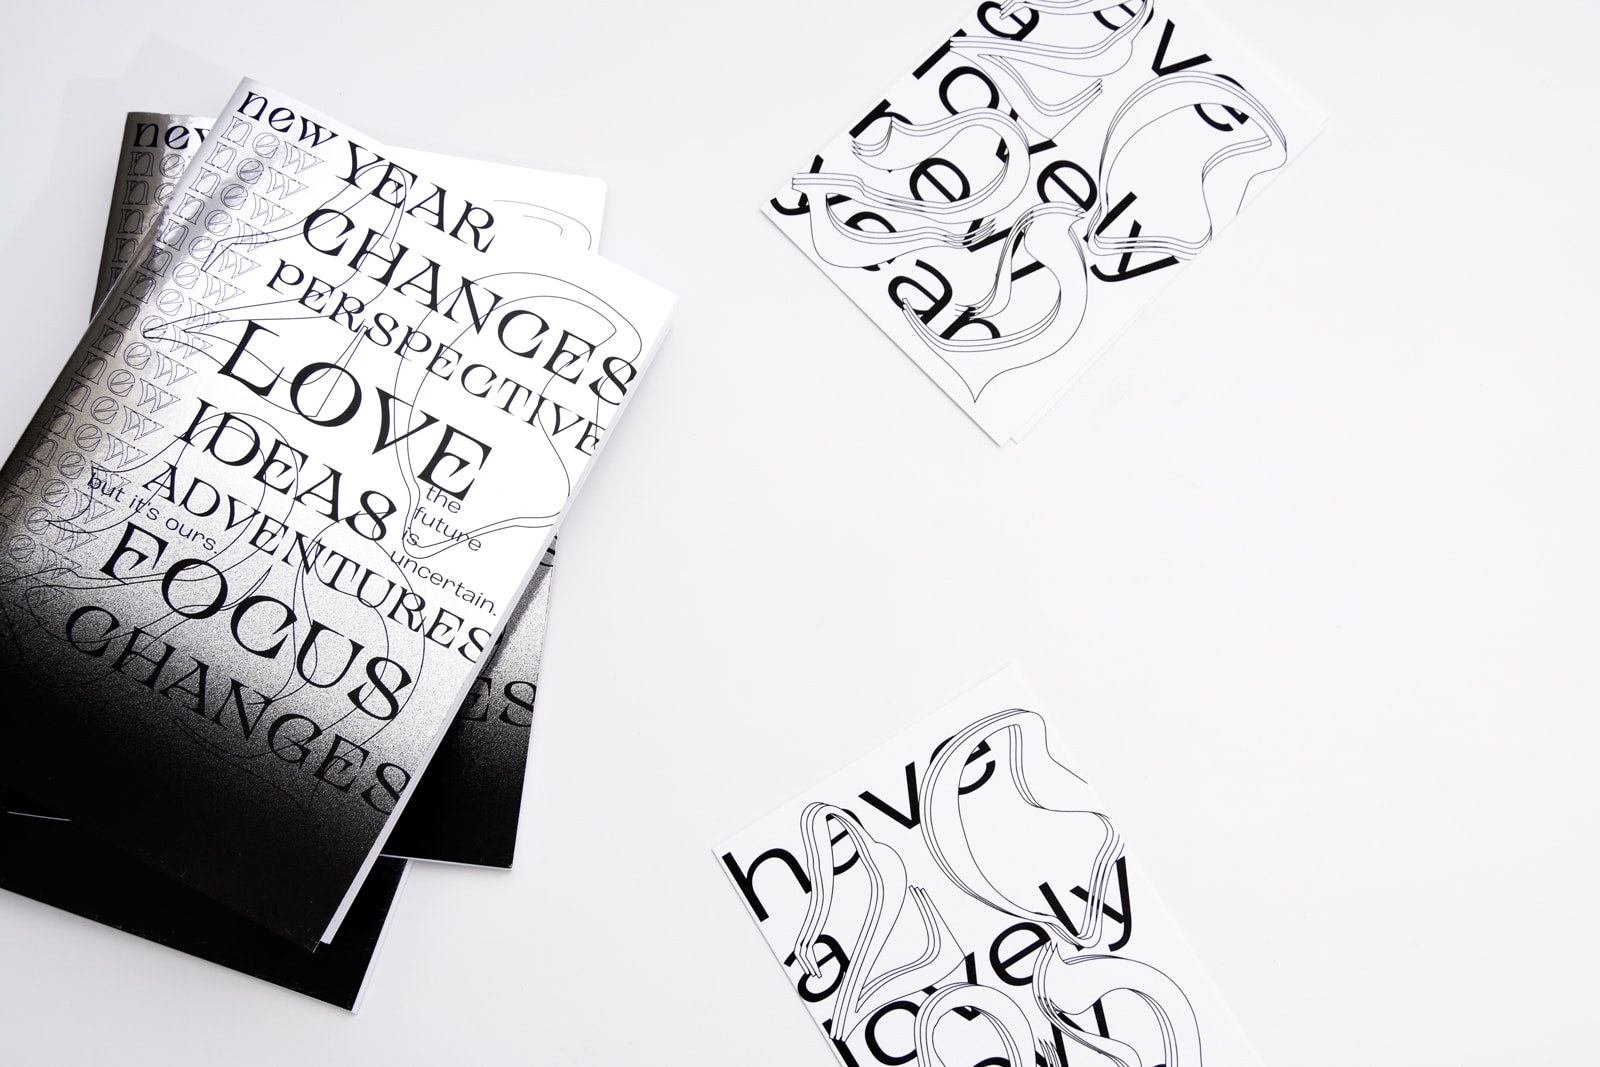 Design_Notizbuch_Weihnachten_2020_StudioPala_5673_bearb